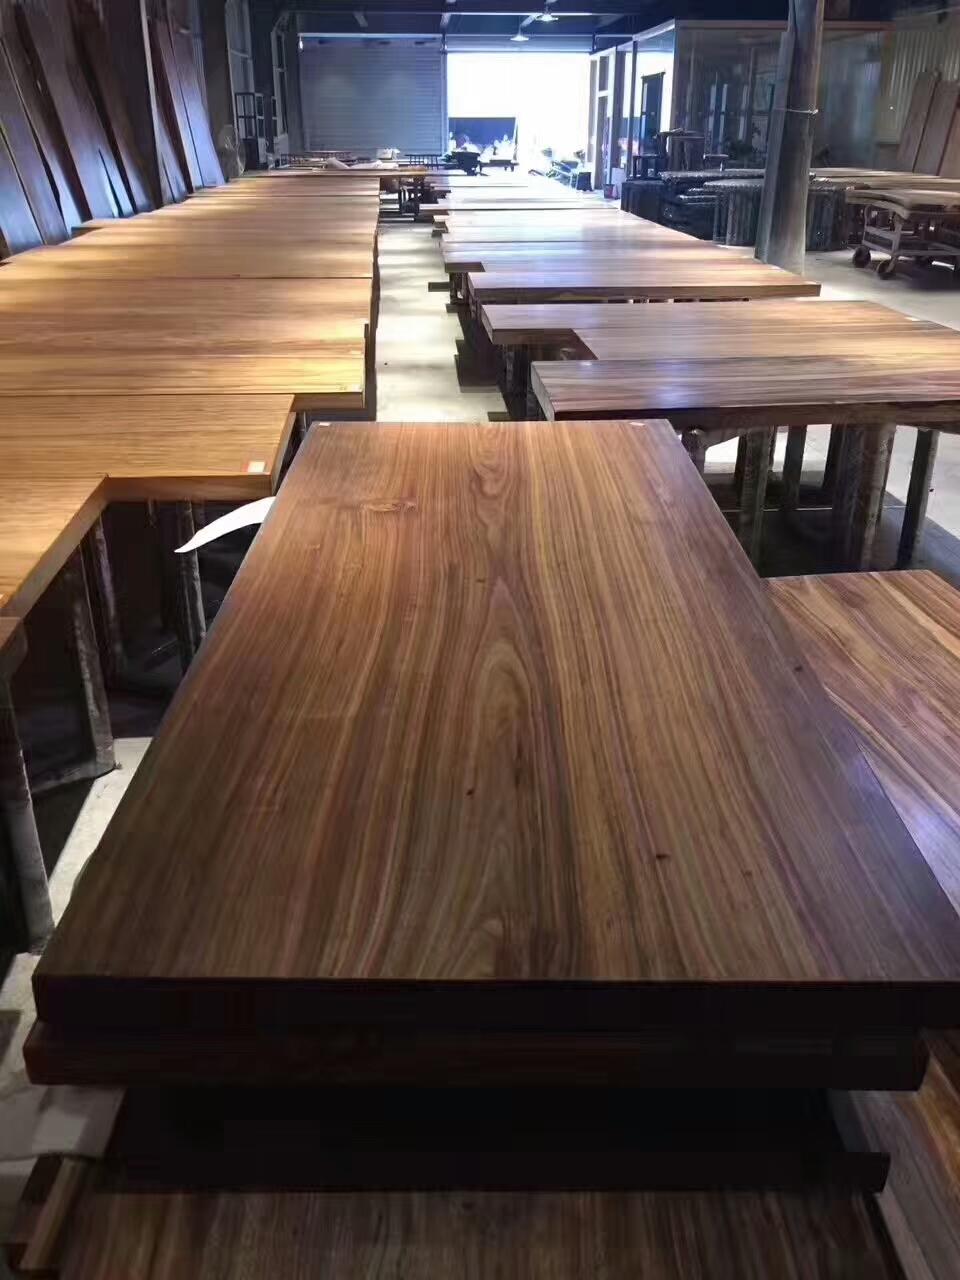 2017 Natural Zebra Wood Slab Table Furniture For Dining Top